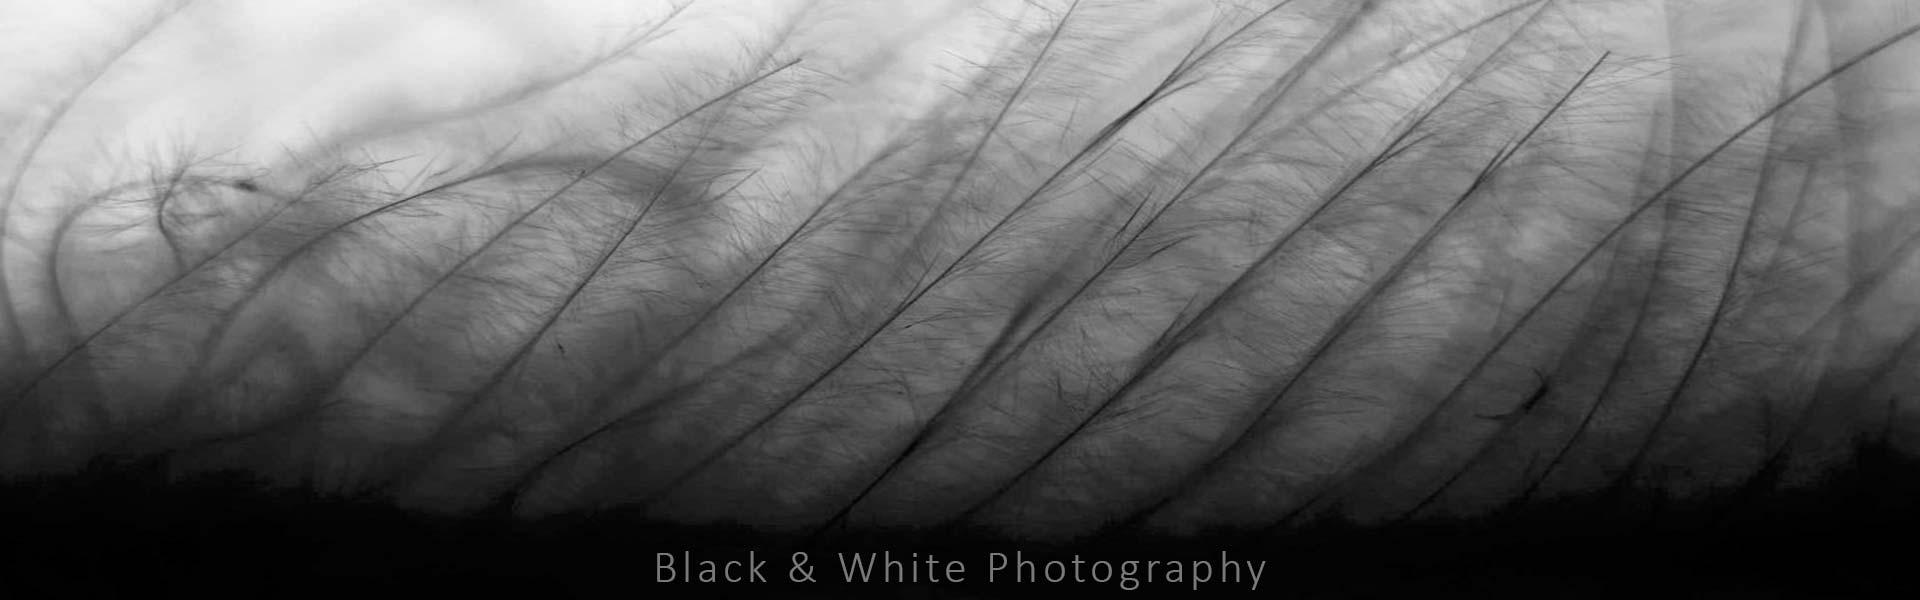 akasi siyah sefid2 - نحوه ی عکاسی سیاه و سفید